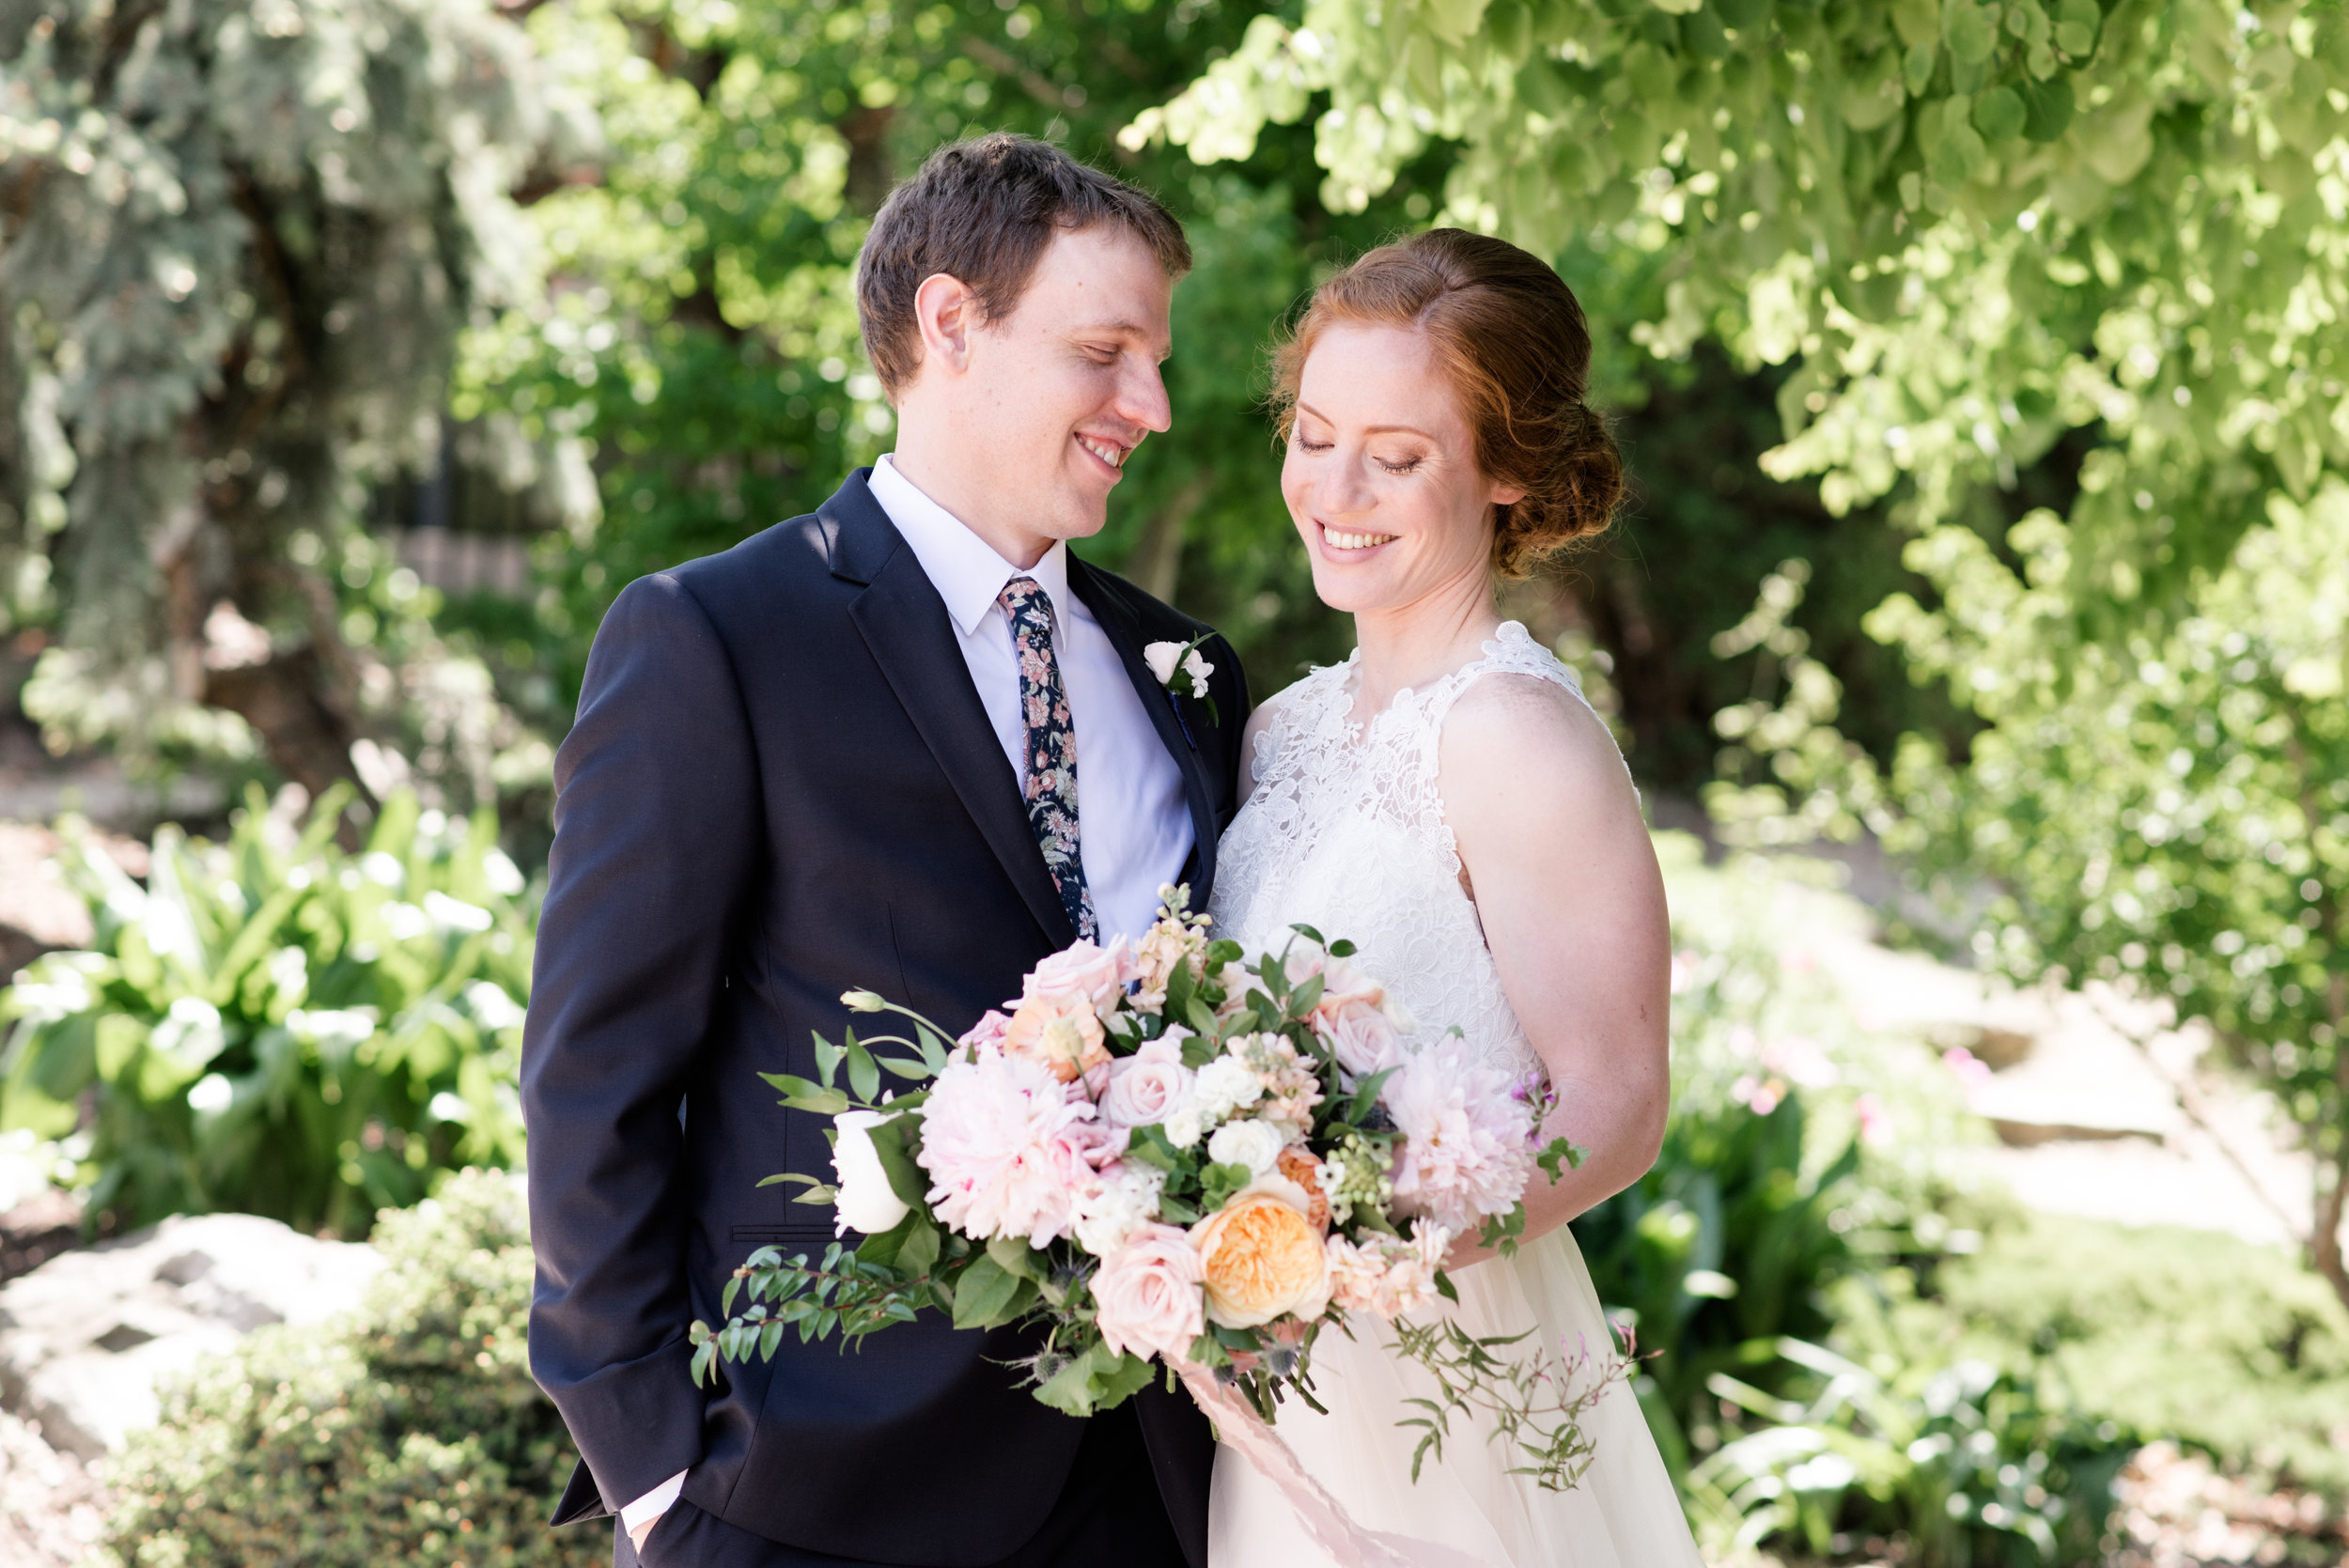 union-south-madison-may-wedding-photography-47.jpg